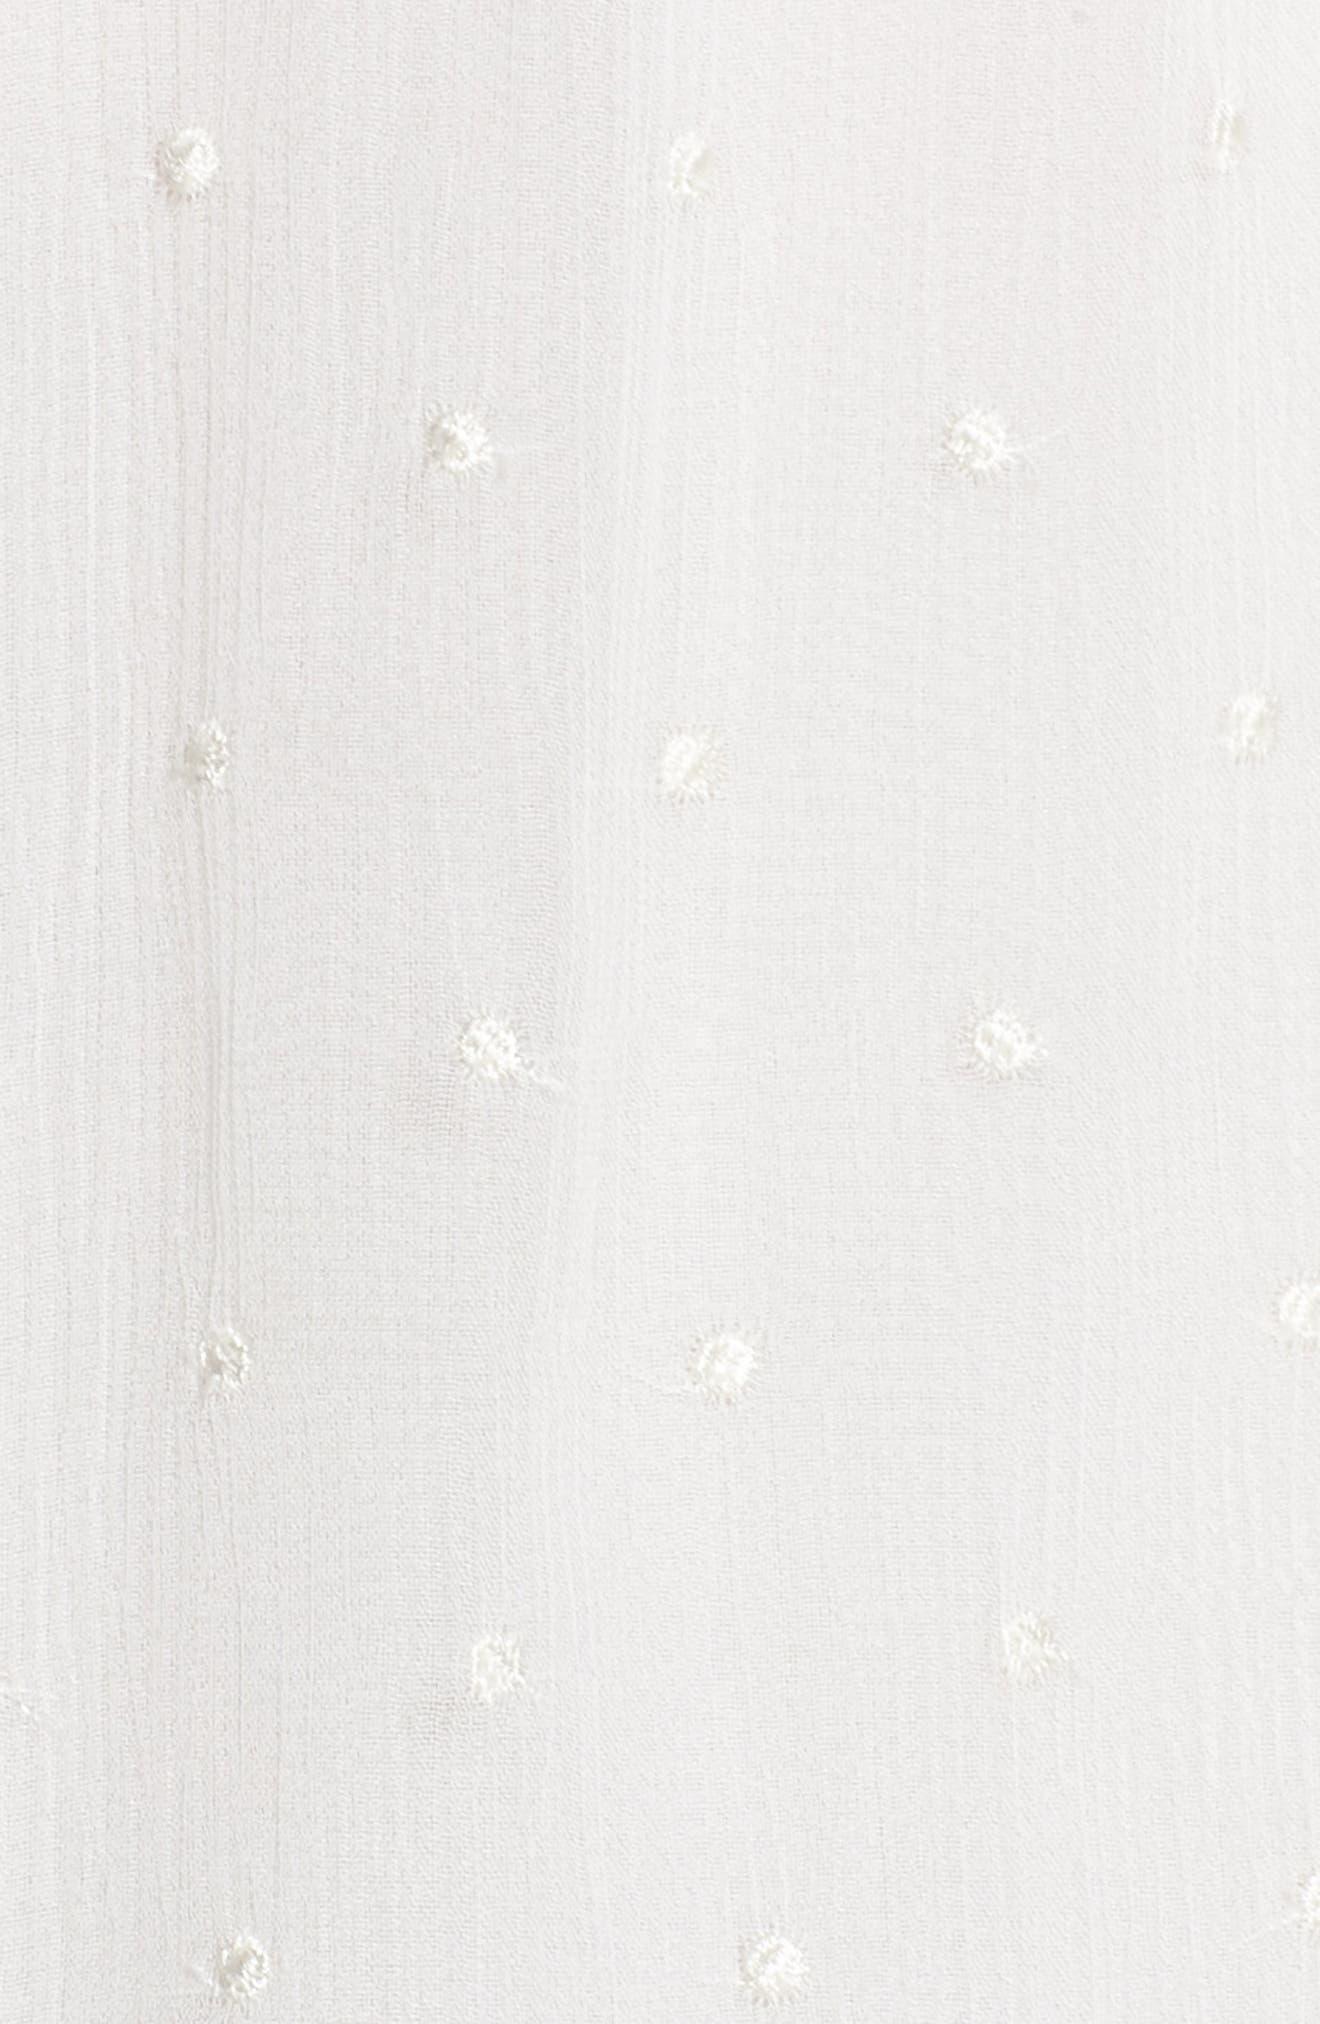 Enchantment Ruffle Chiffon Minidress,                             Alternate thumbnail 5, color,                             White